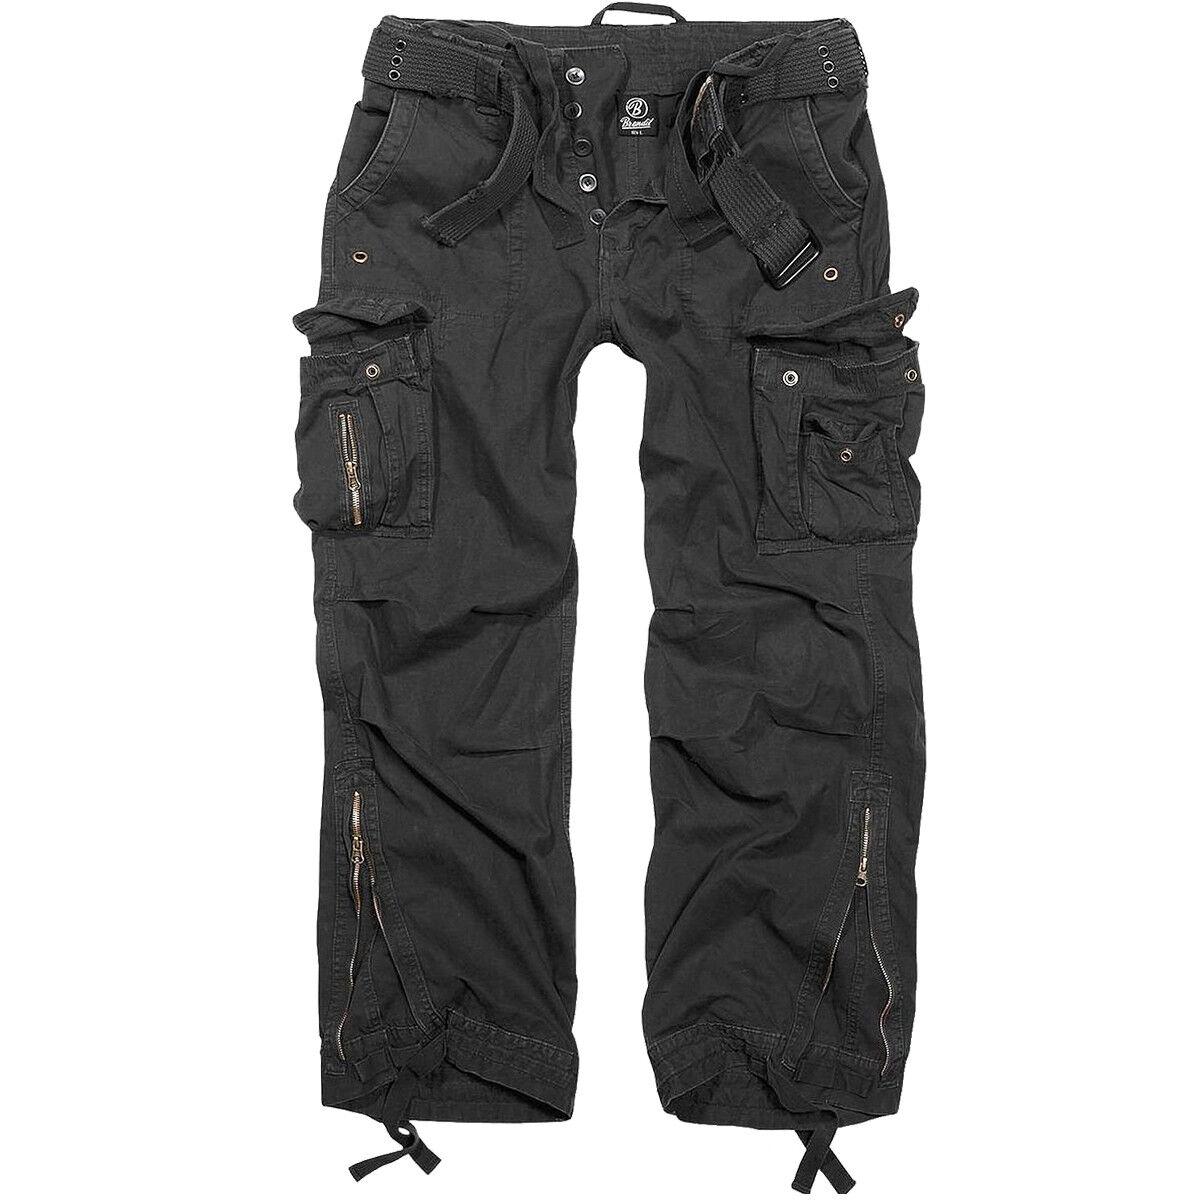 34148928e0 Brandit Royal Vintage Pantaloni Combat Uomo Sicurezza Pantalone Militare  Cotone nrpriw8243-Pantaloni